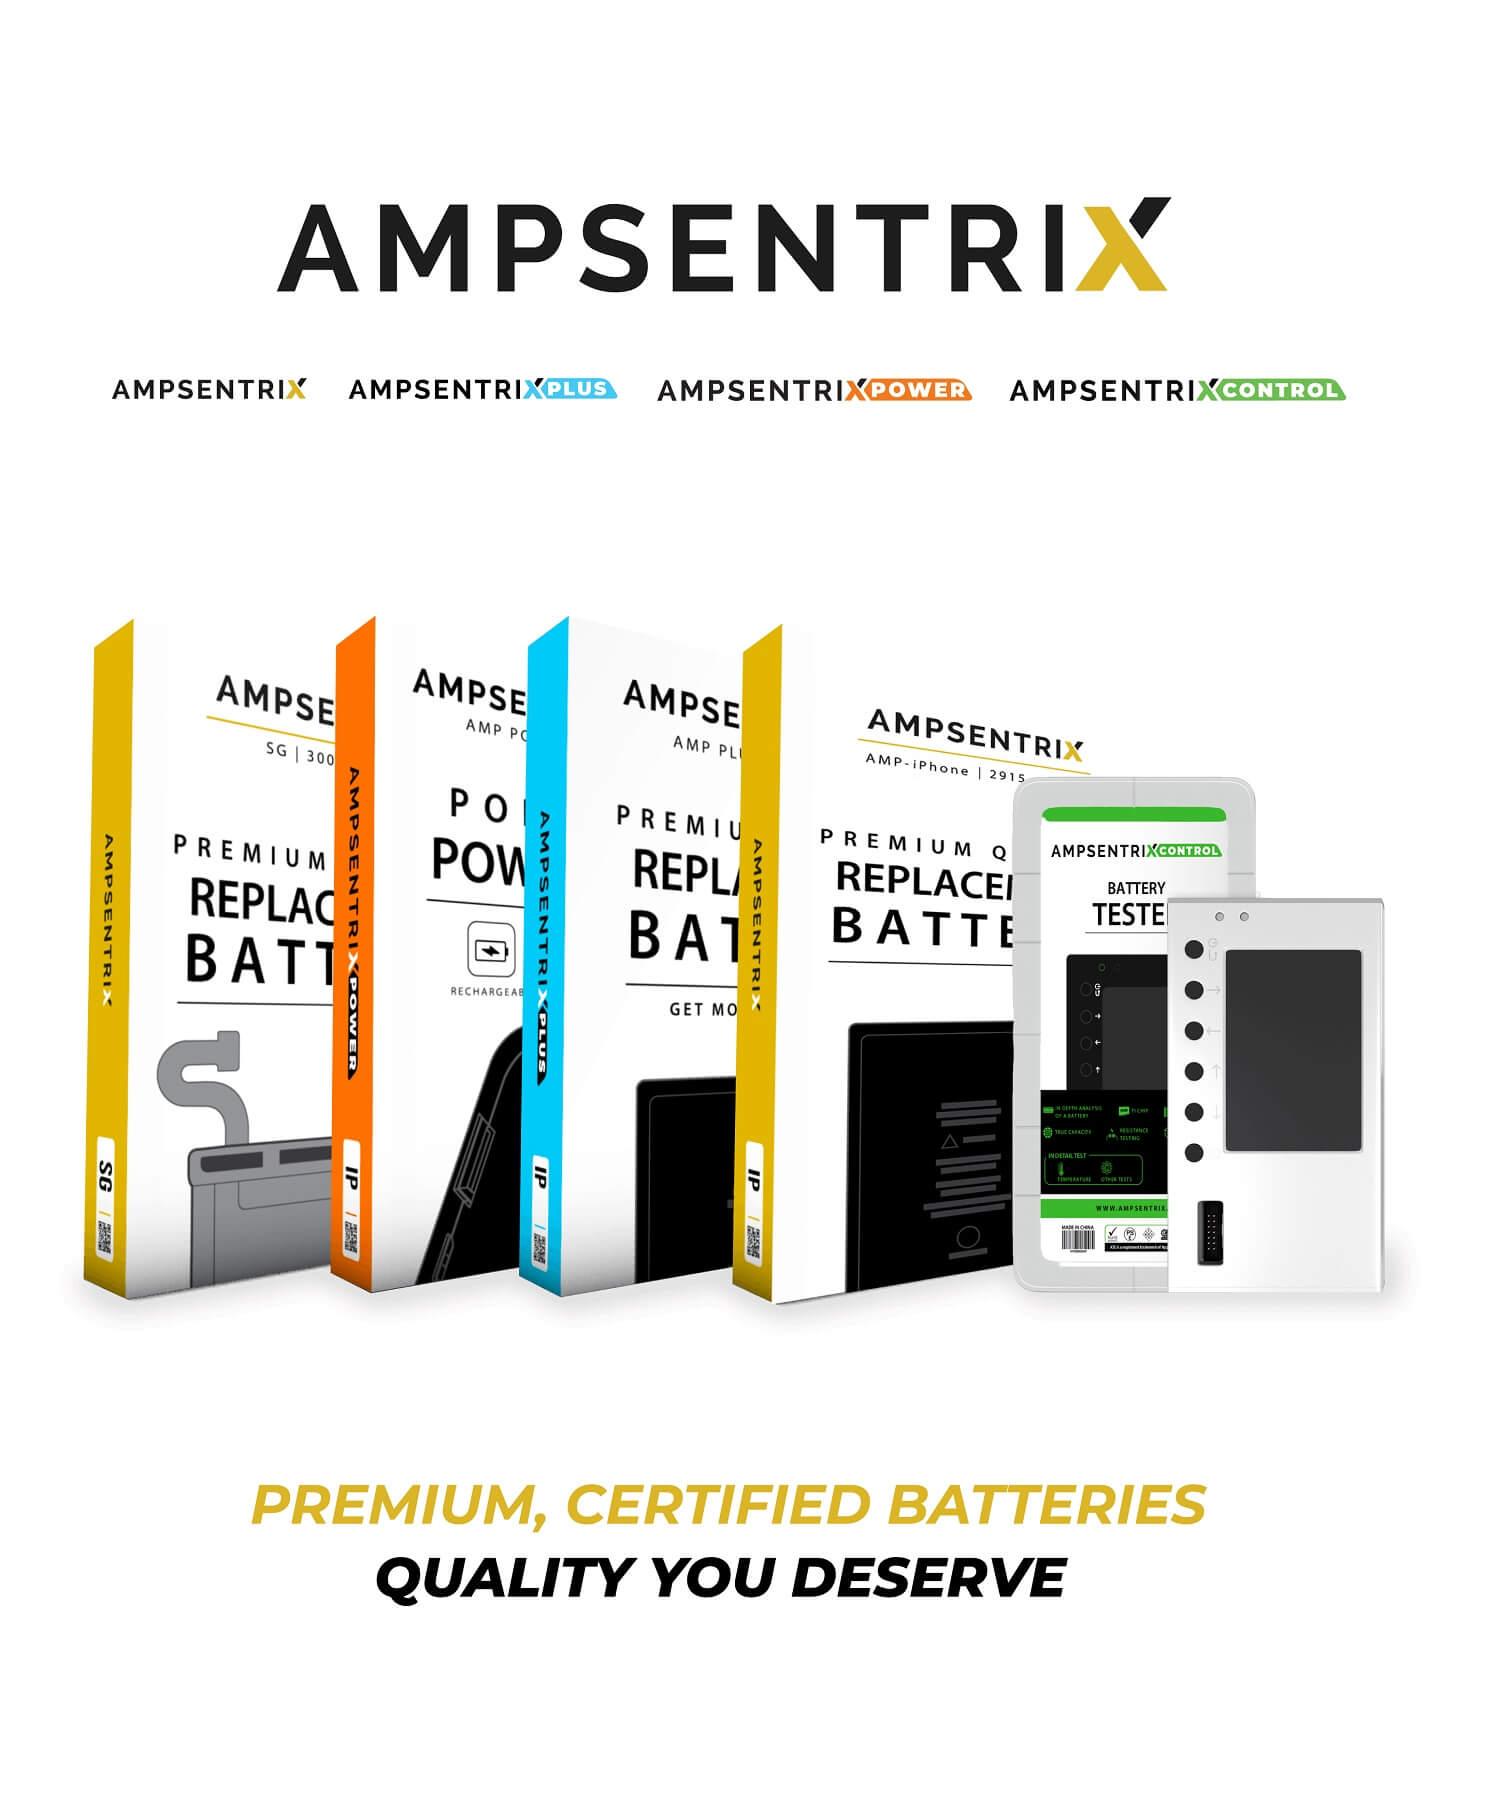 ampsentrix batteries